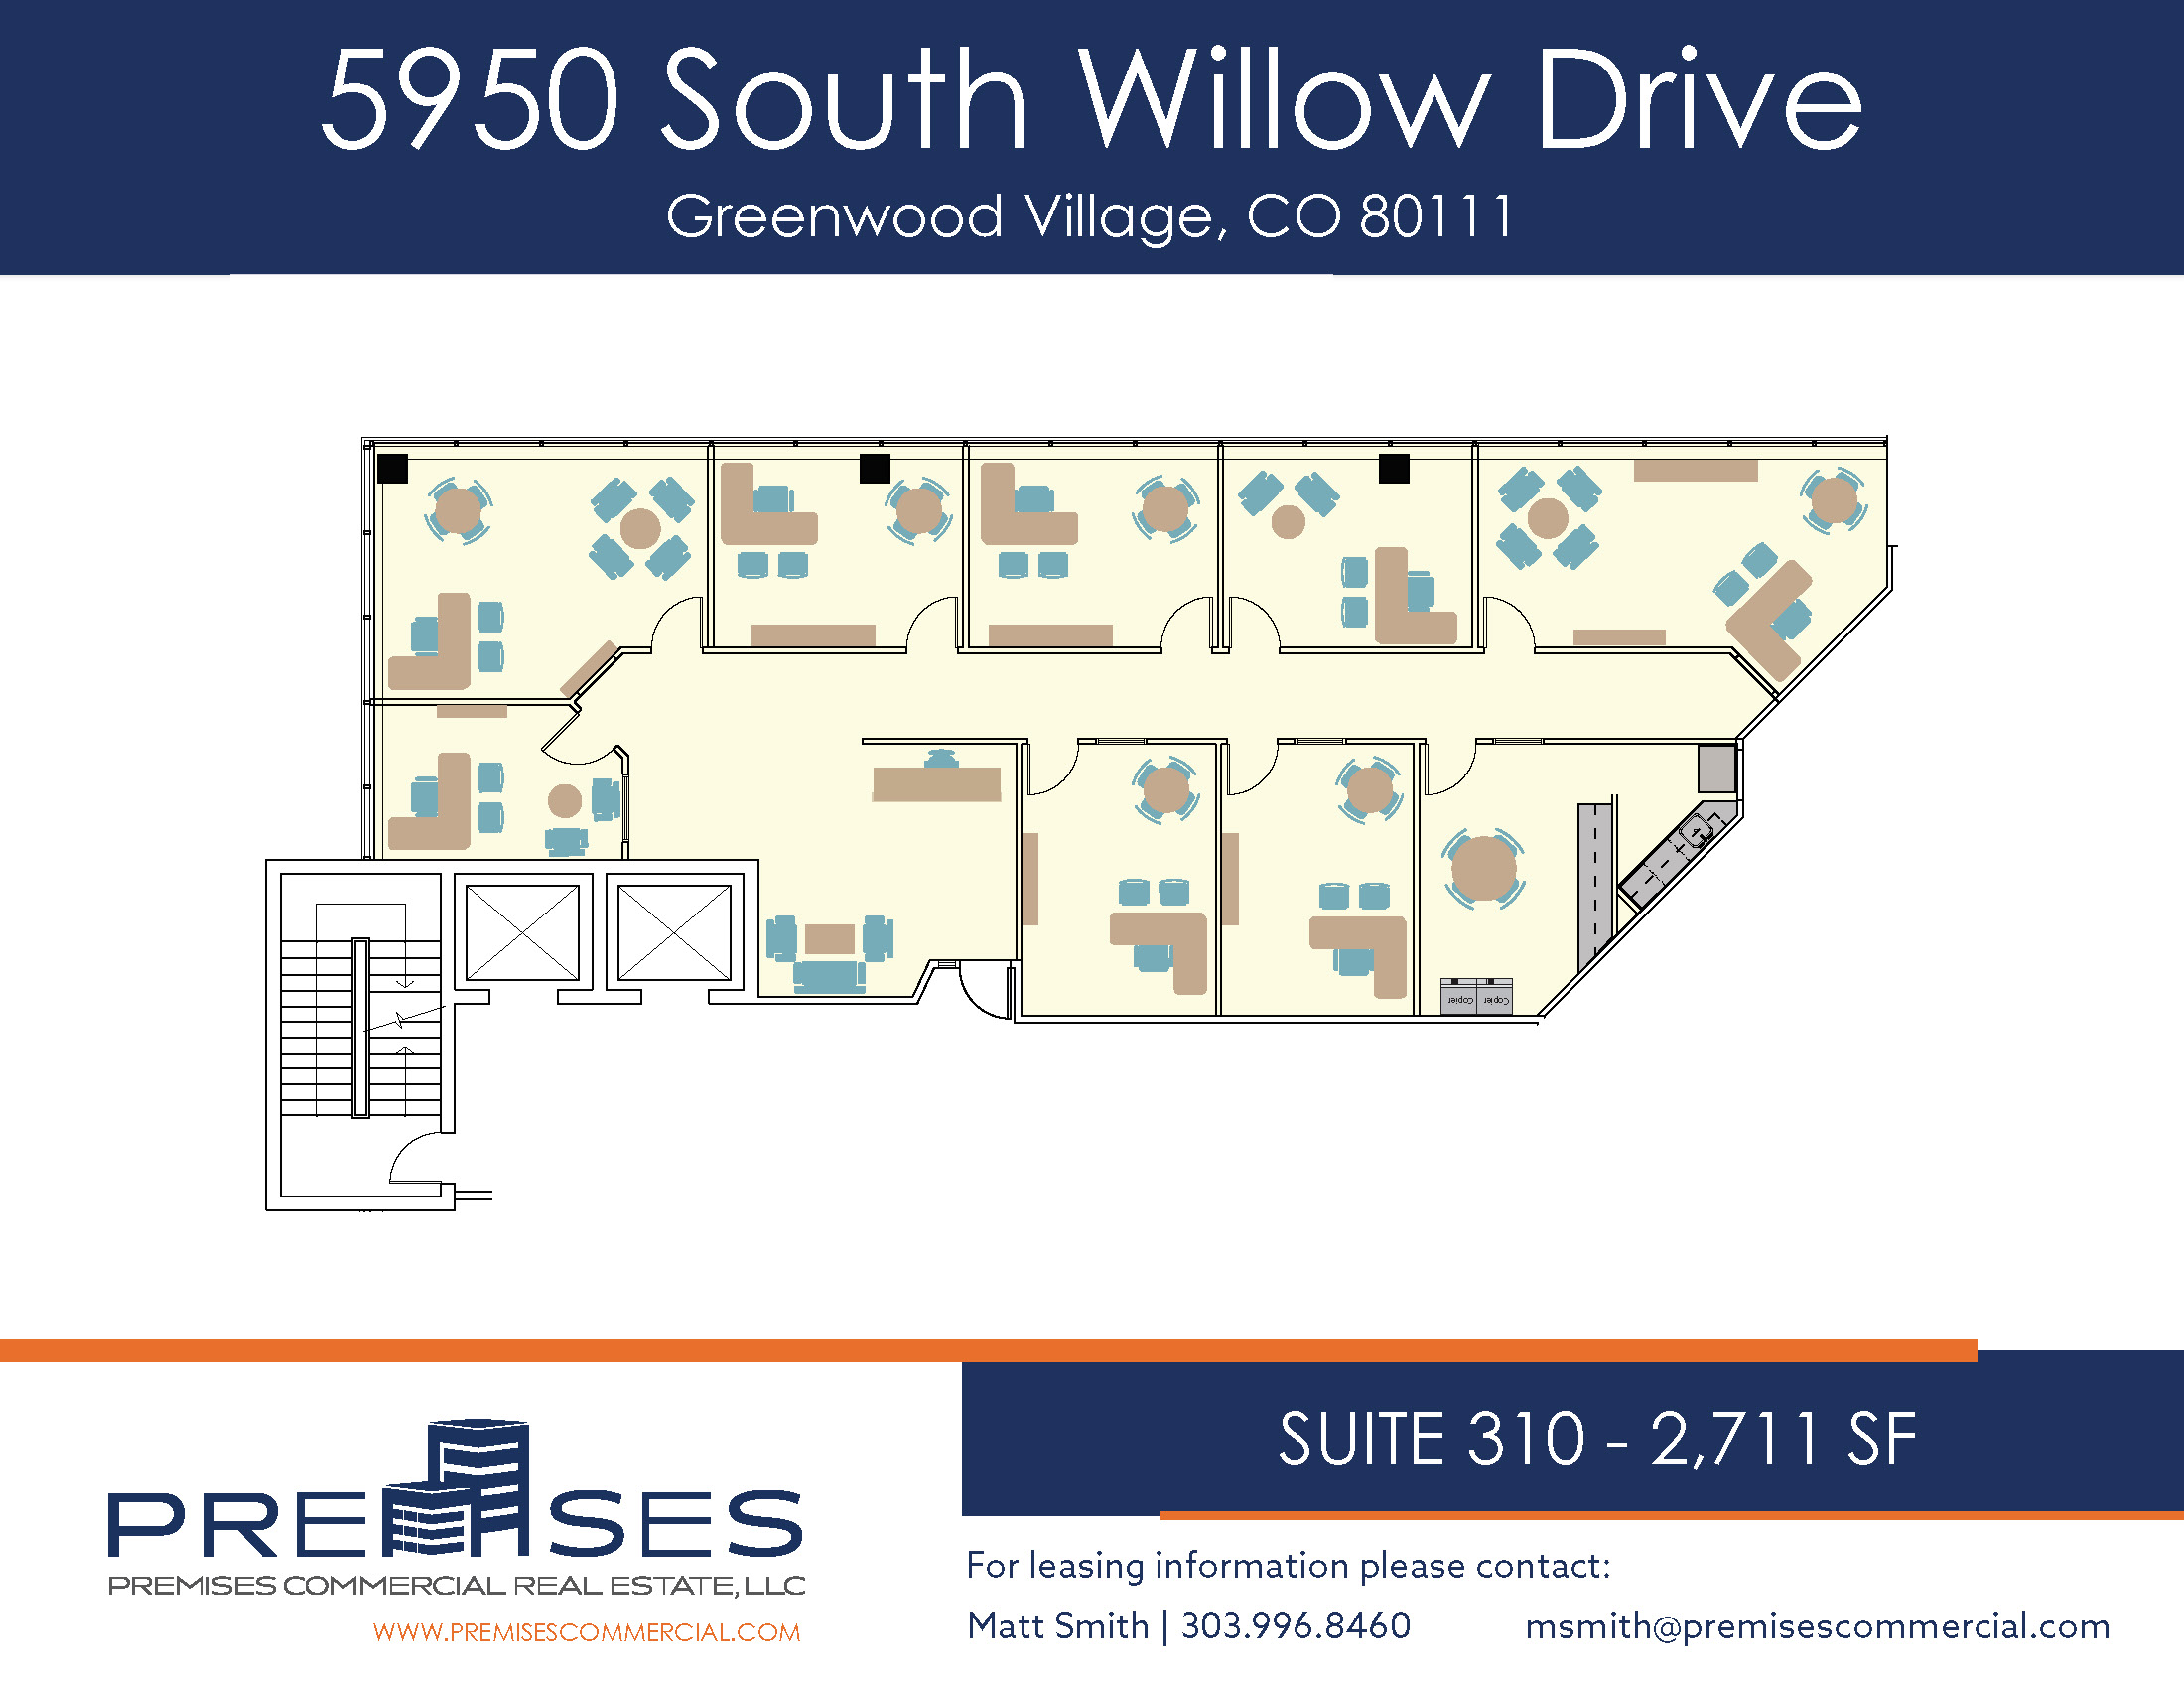 Suite 310 - 2,711 sf